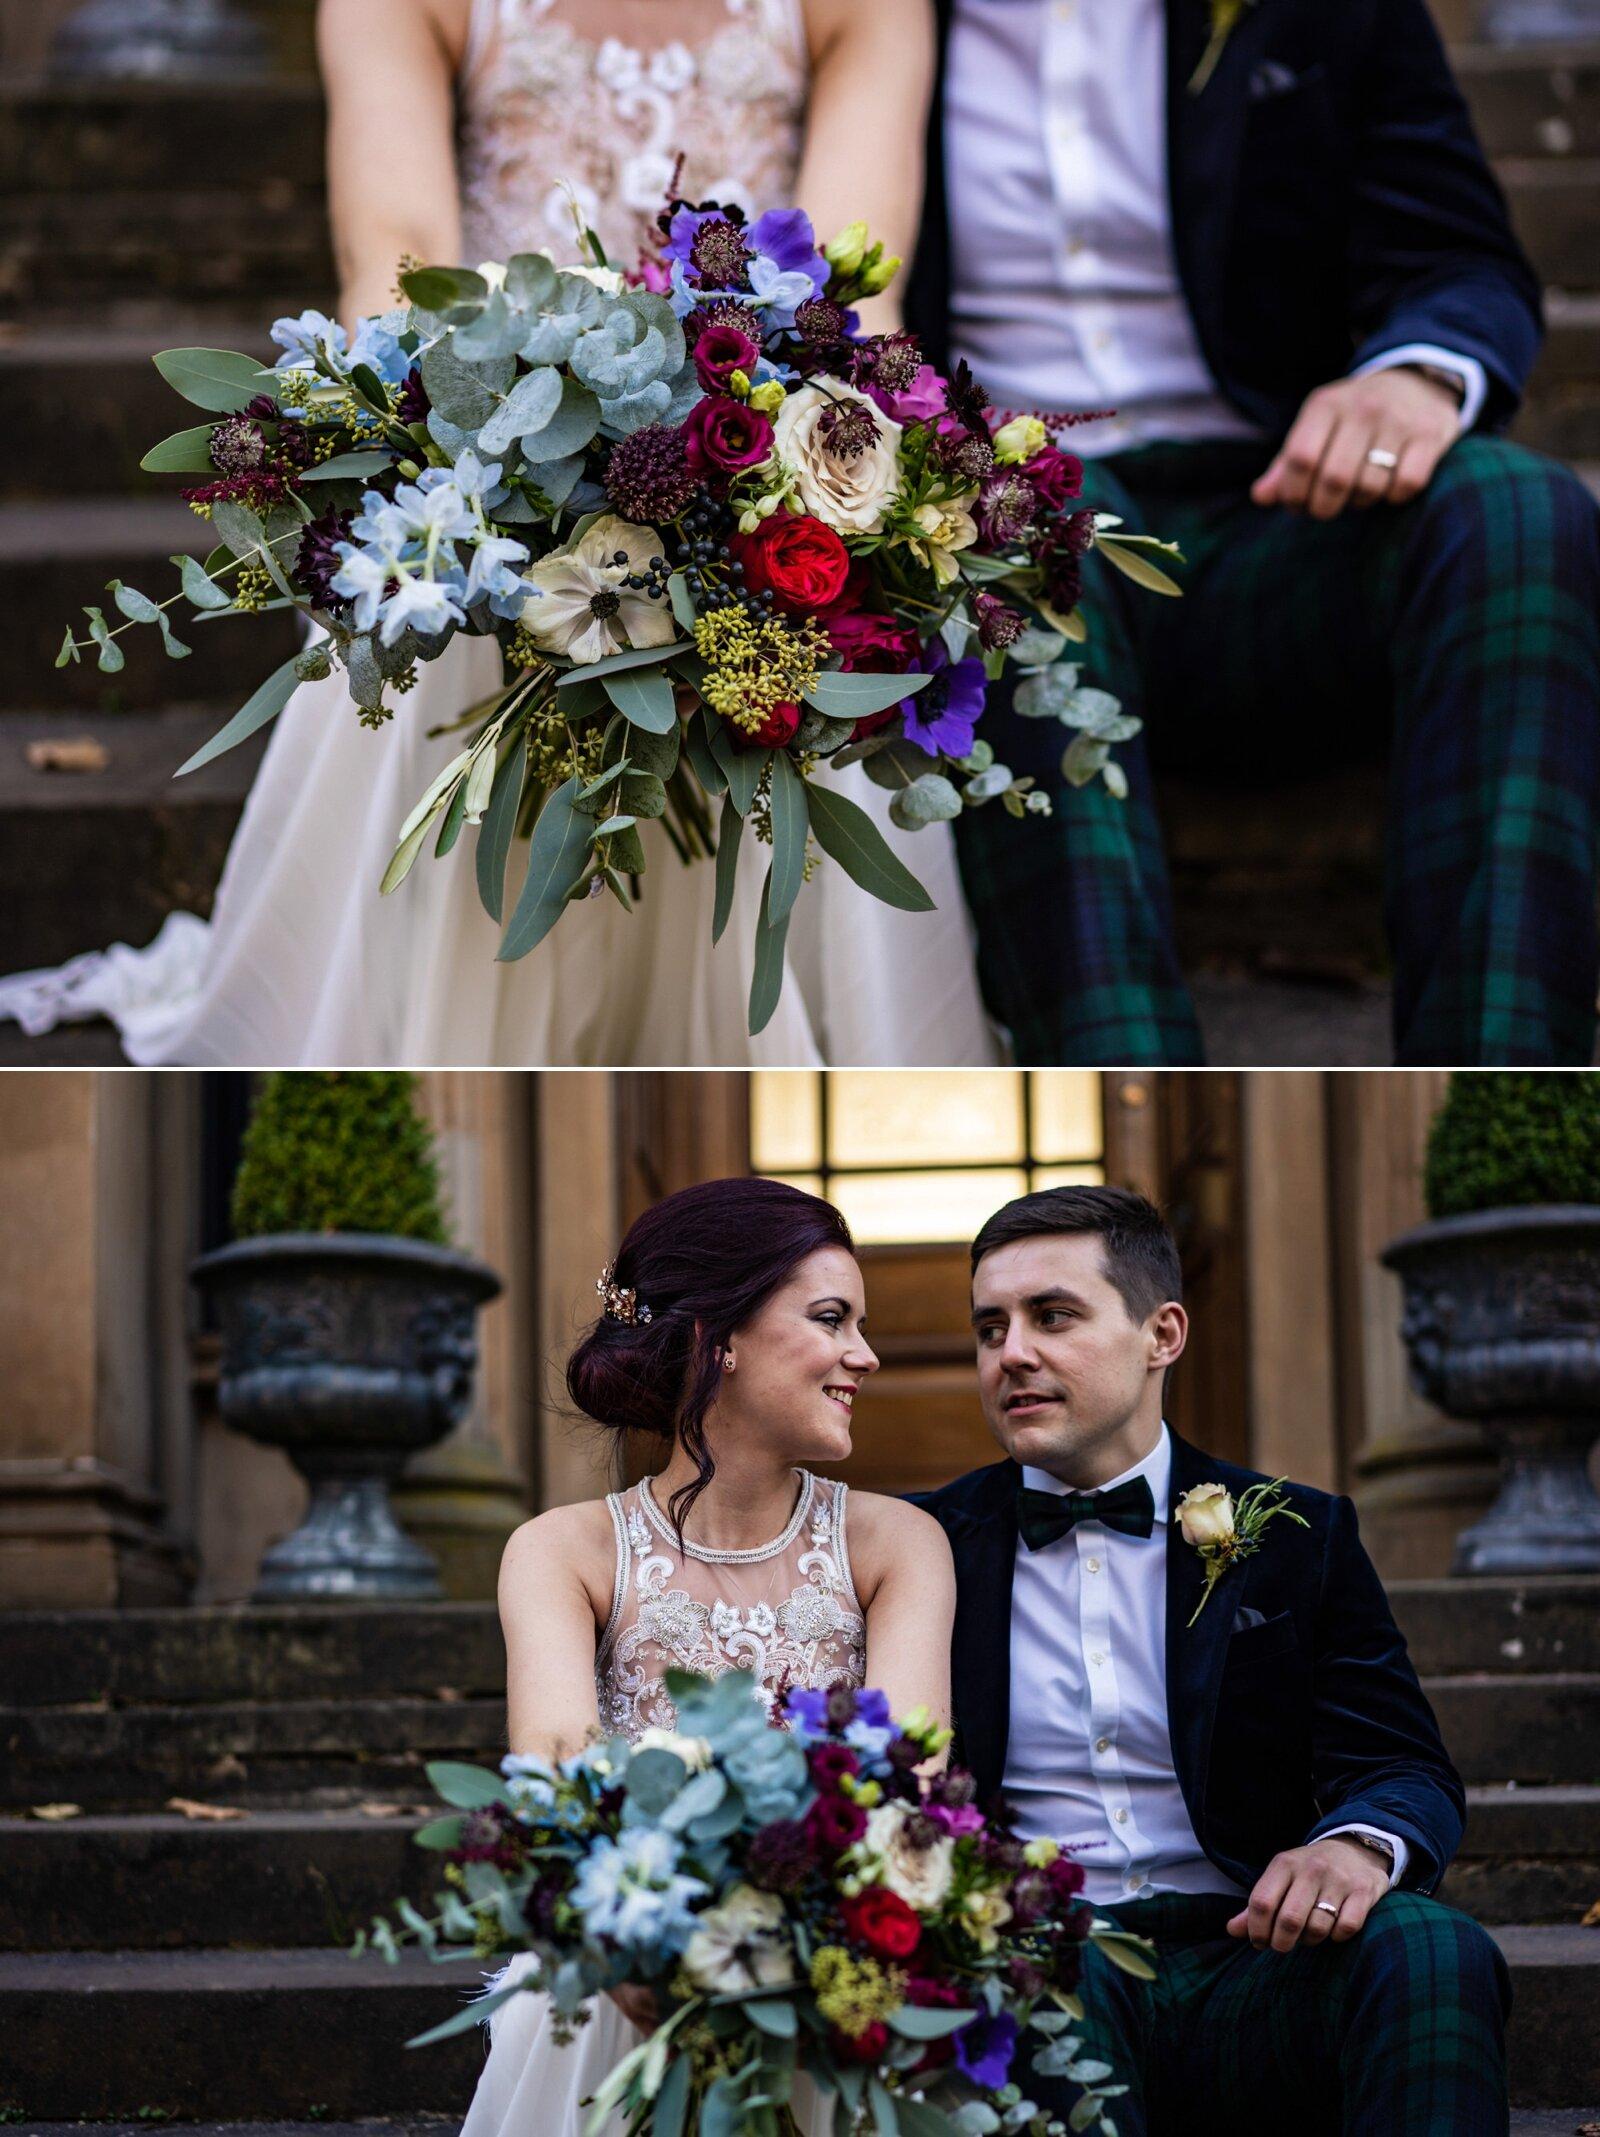 Andy&Szerdi-Photography_Couple_Elaine-Stephen-2.jpg